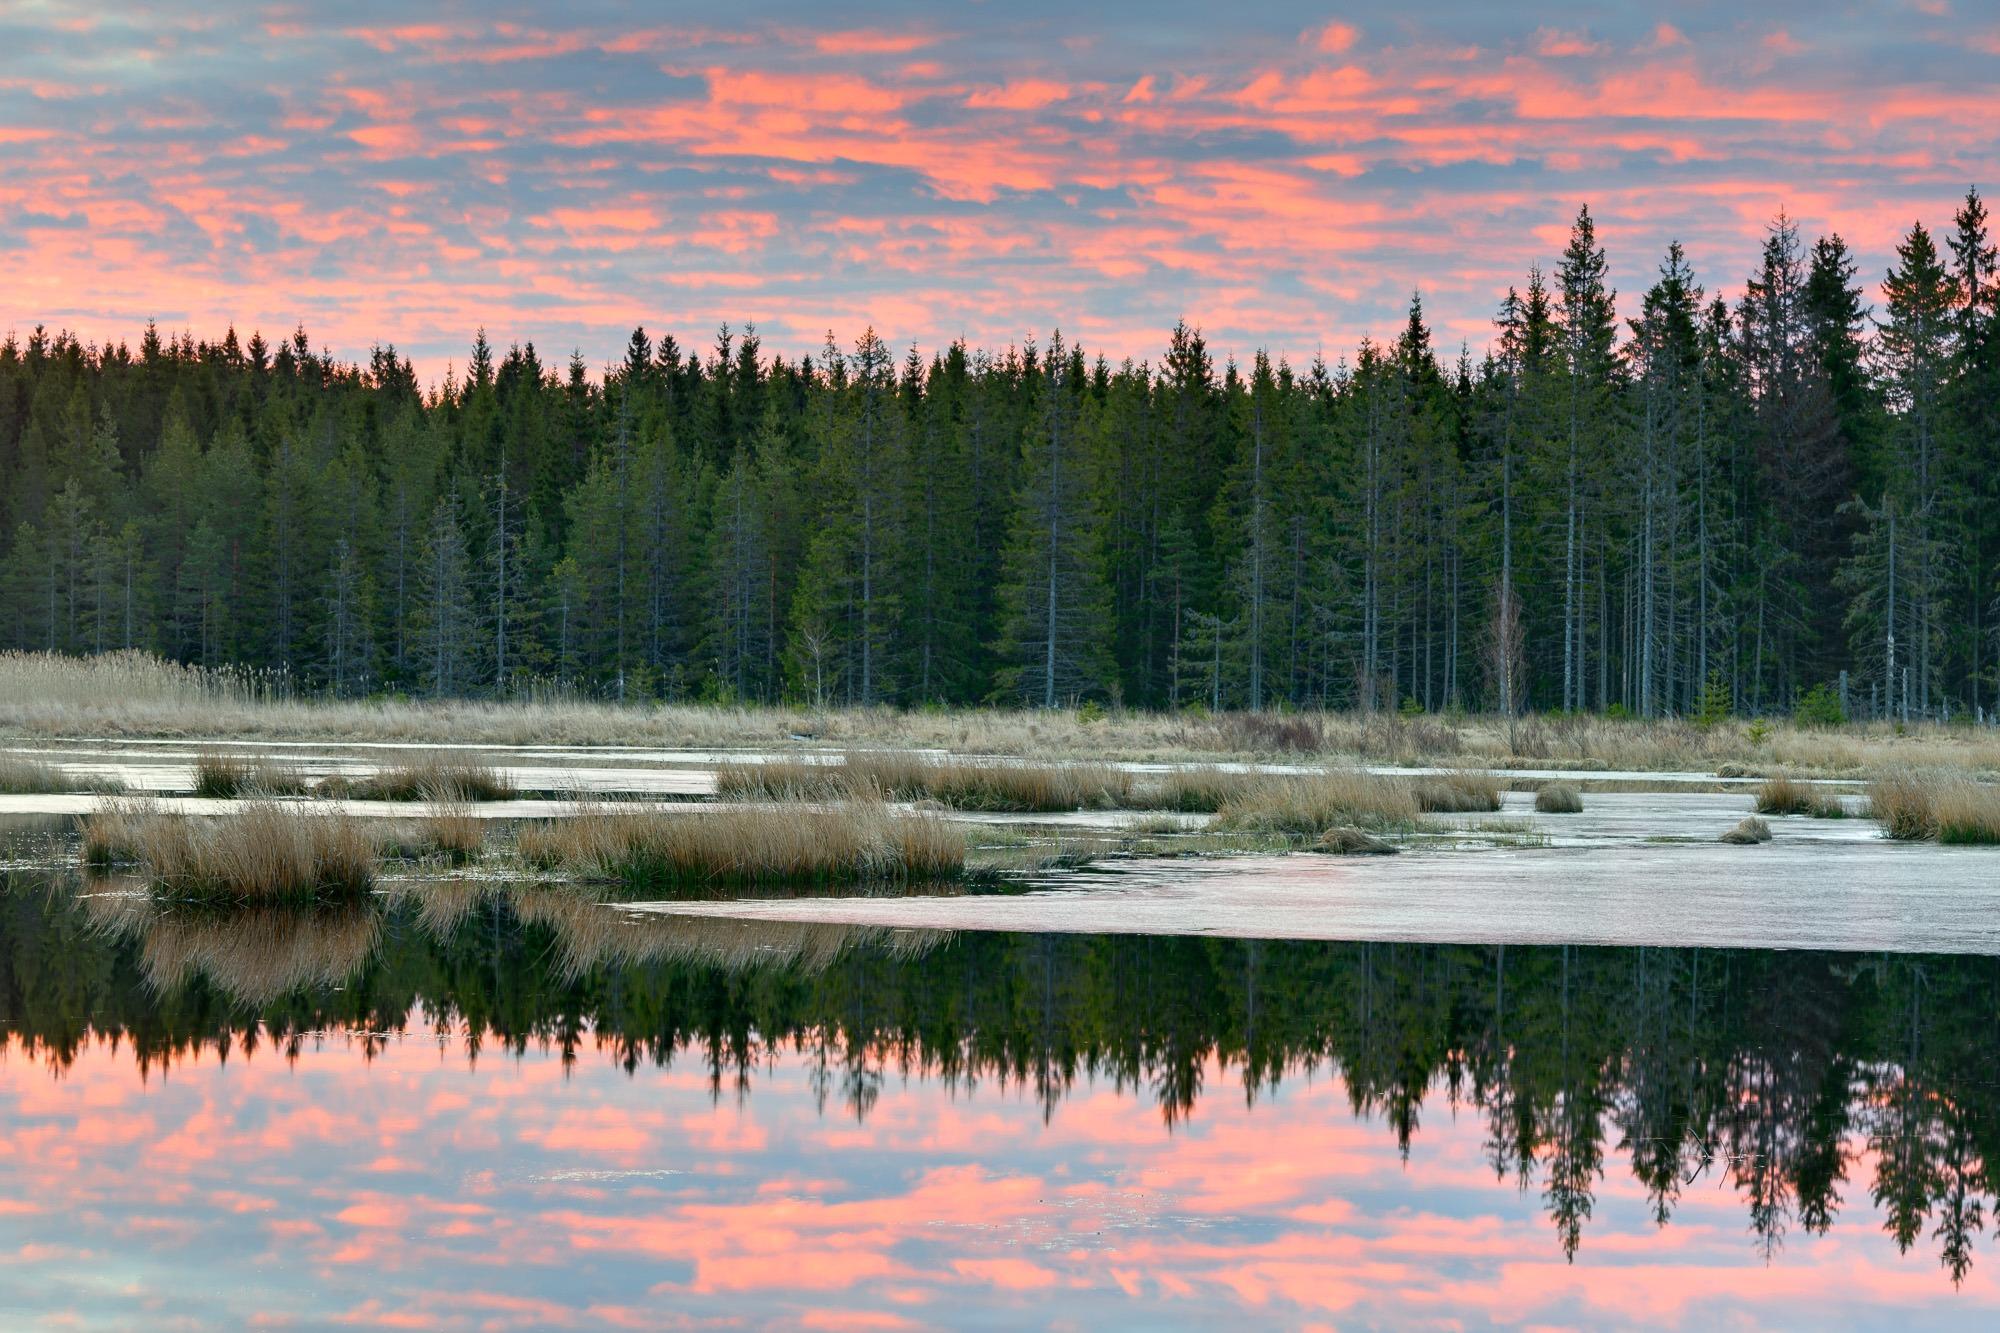 Fågelsjön, Hunneberg, Sweden